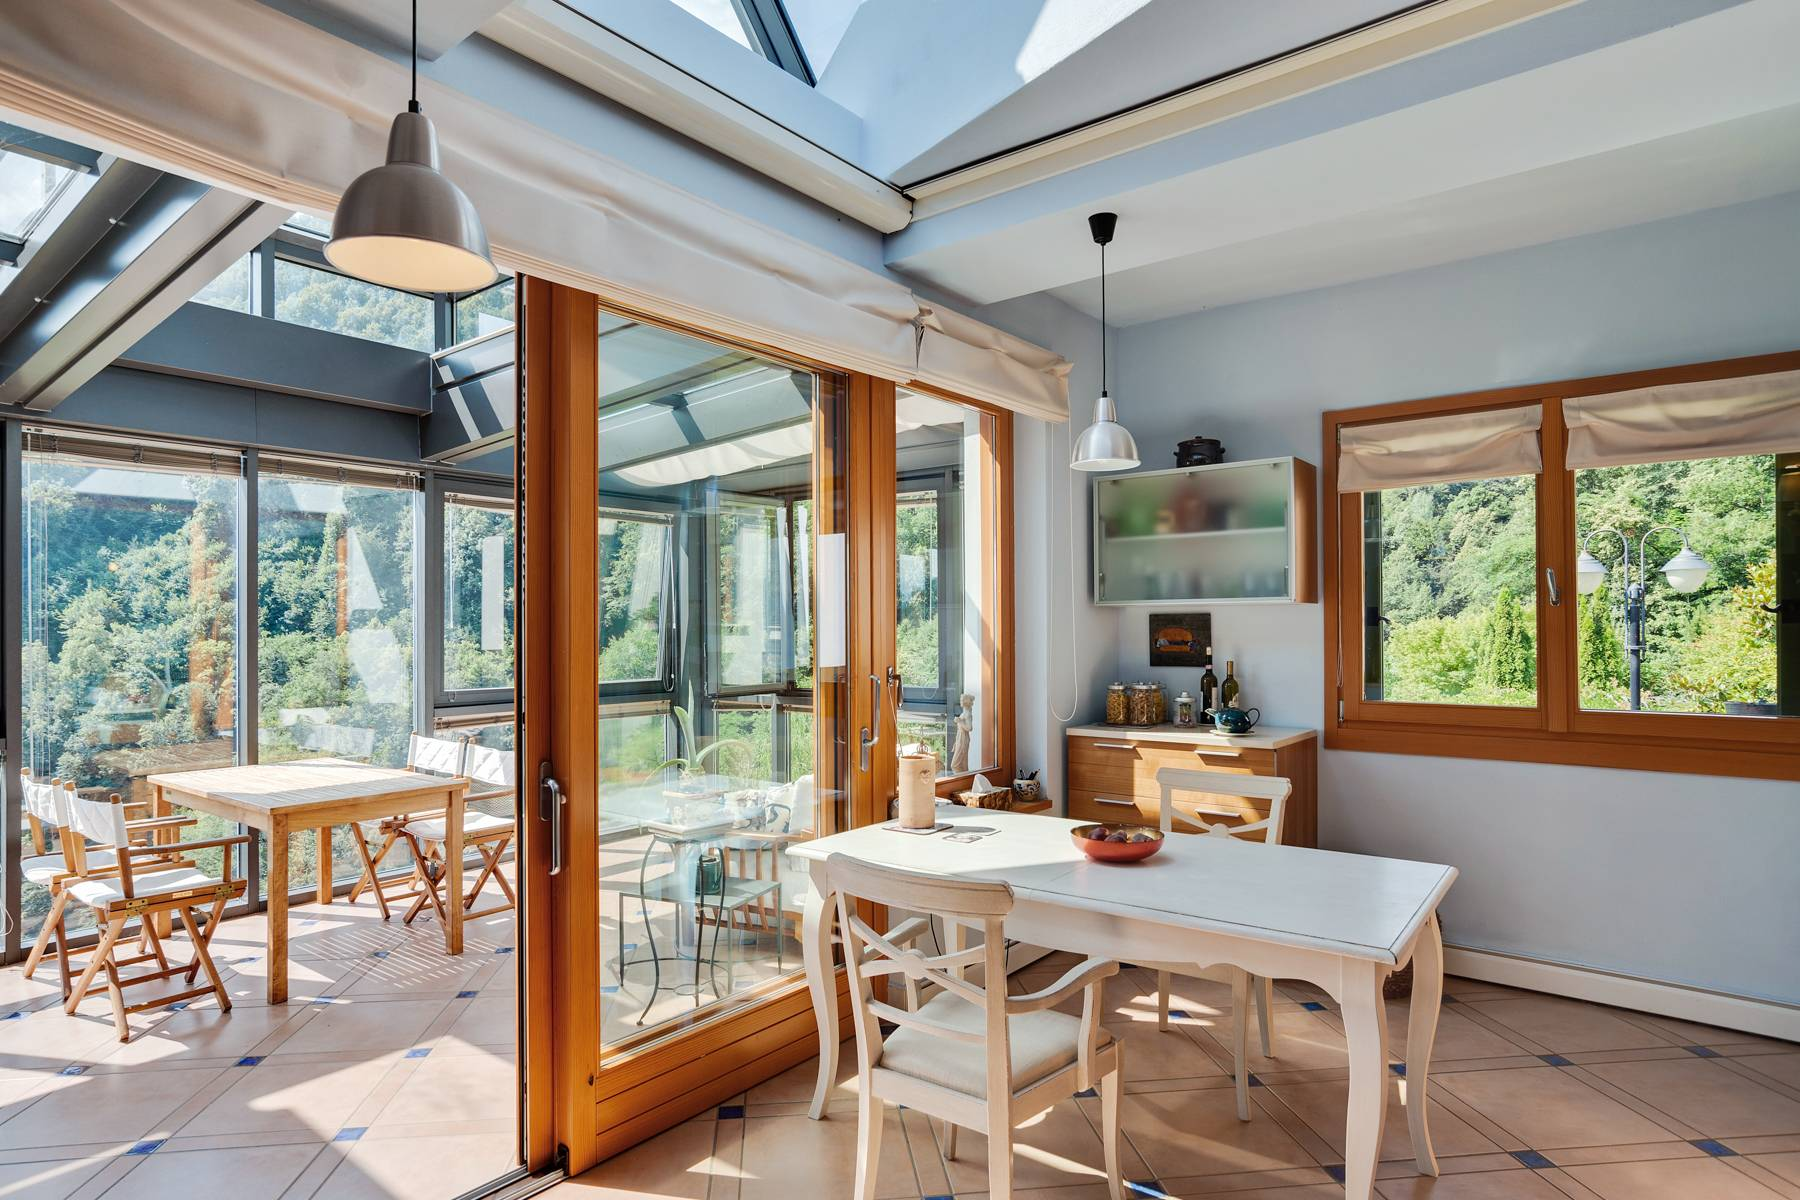 Splendida villa moderna sulla collina soleggiata sopra Argegno - 17